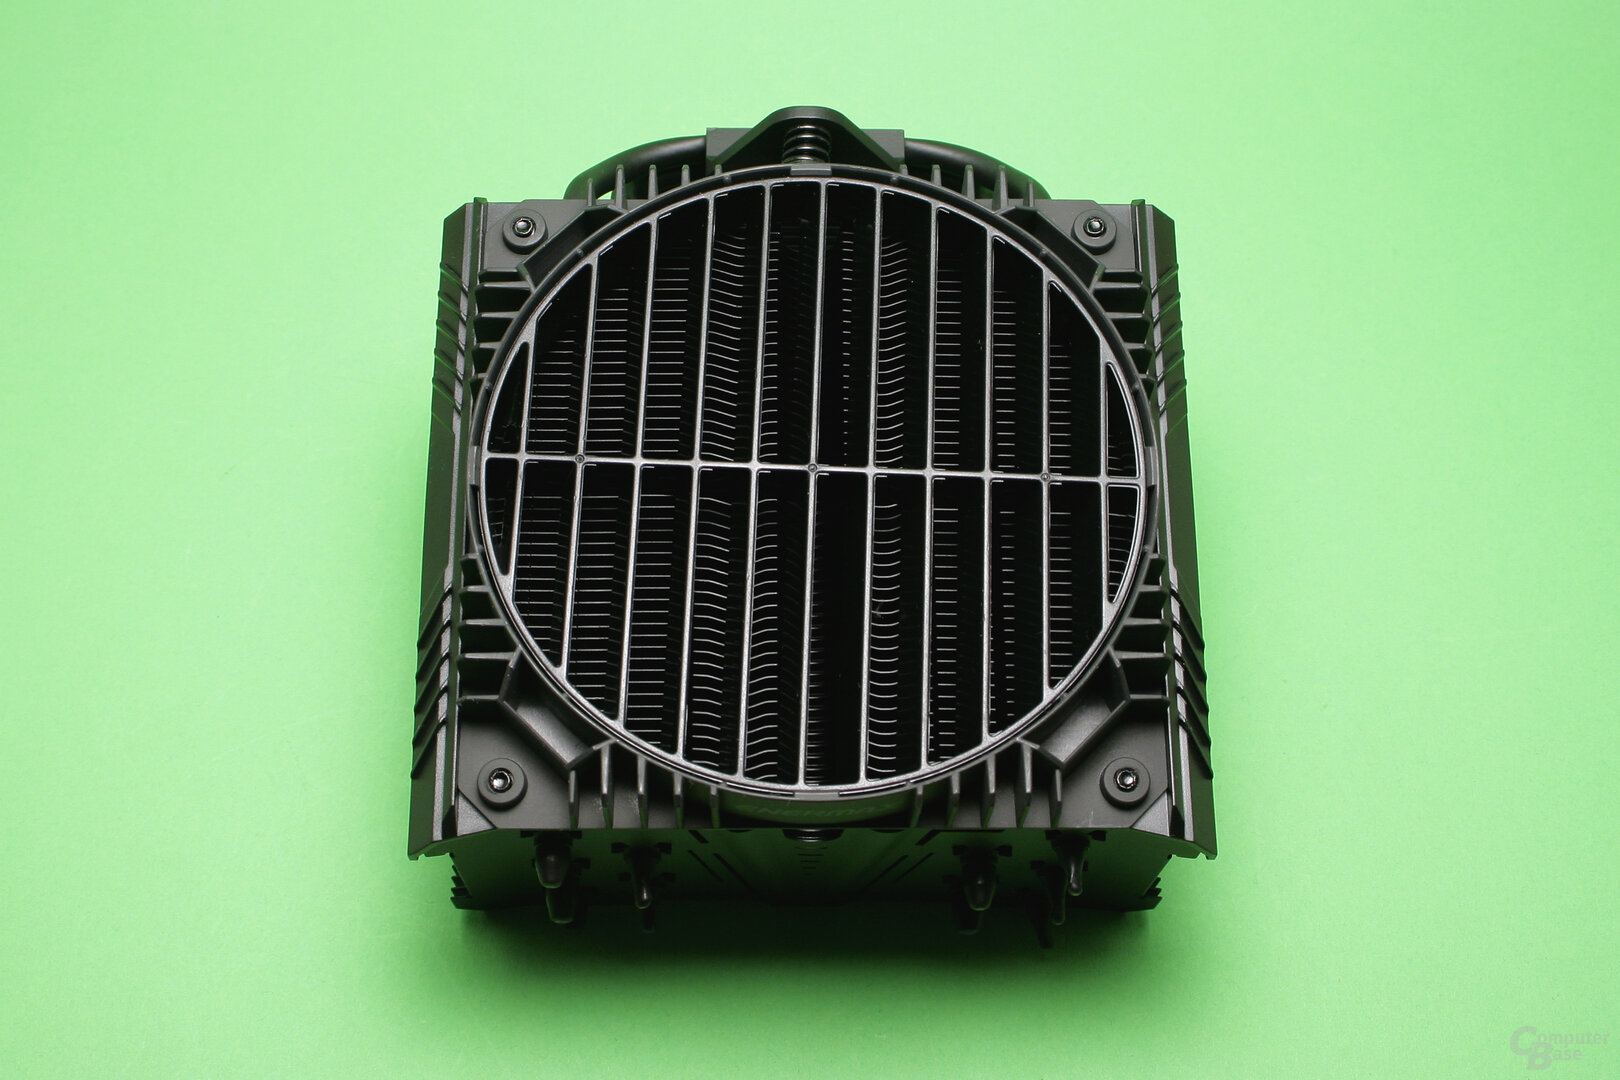 Enermax ETS-T50 Axe Silent Edition: Fan Duct